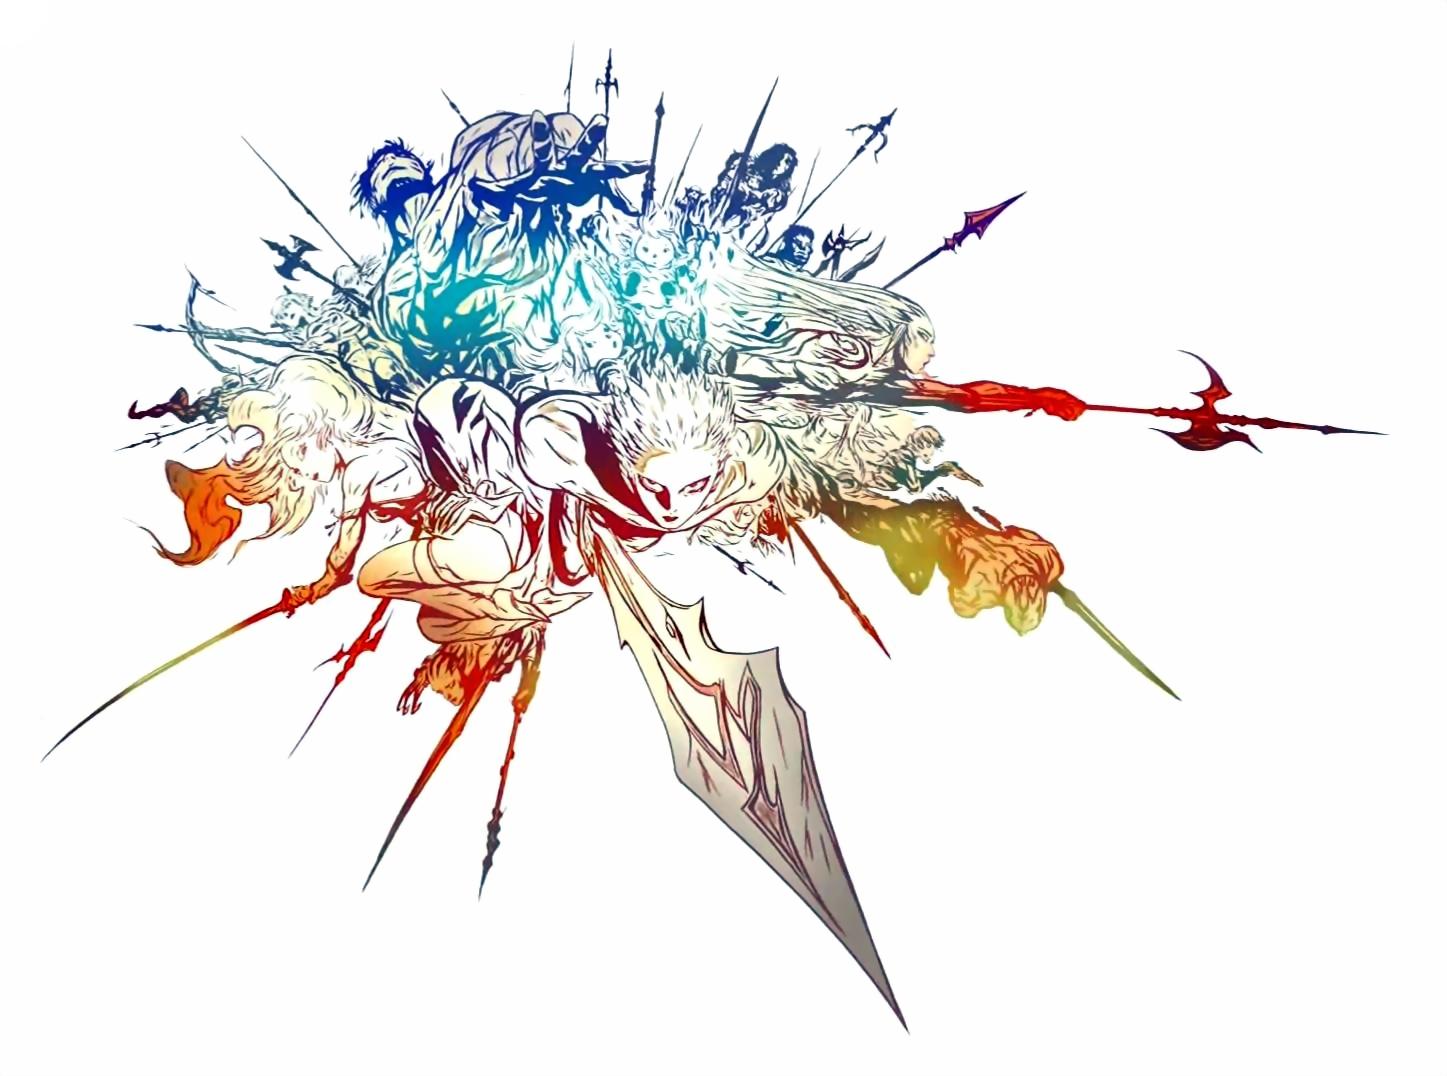 Yoshitaka Amano Every Final Fantasy has one piece of